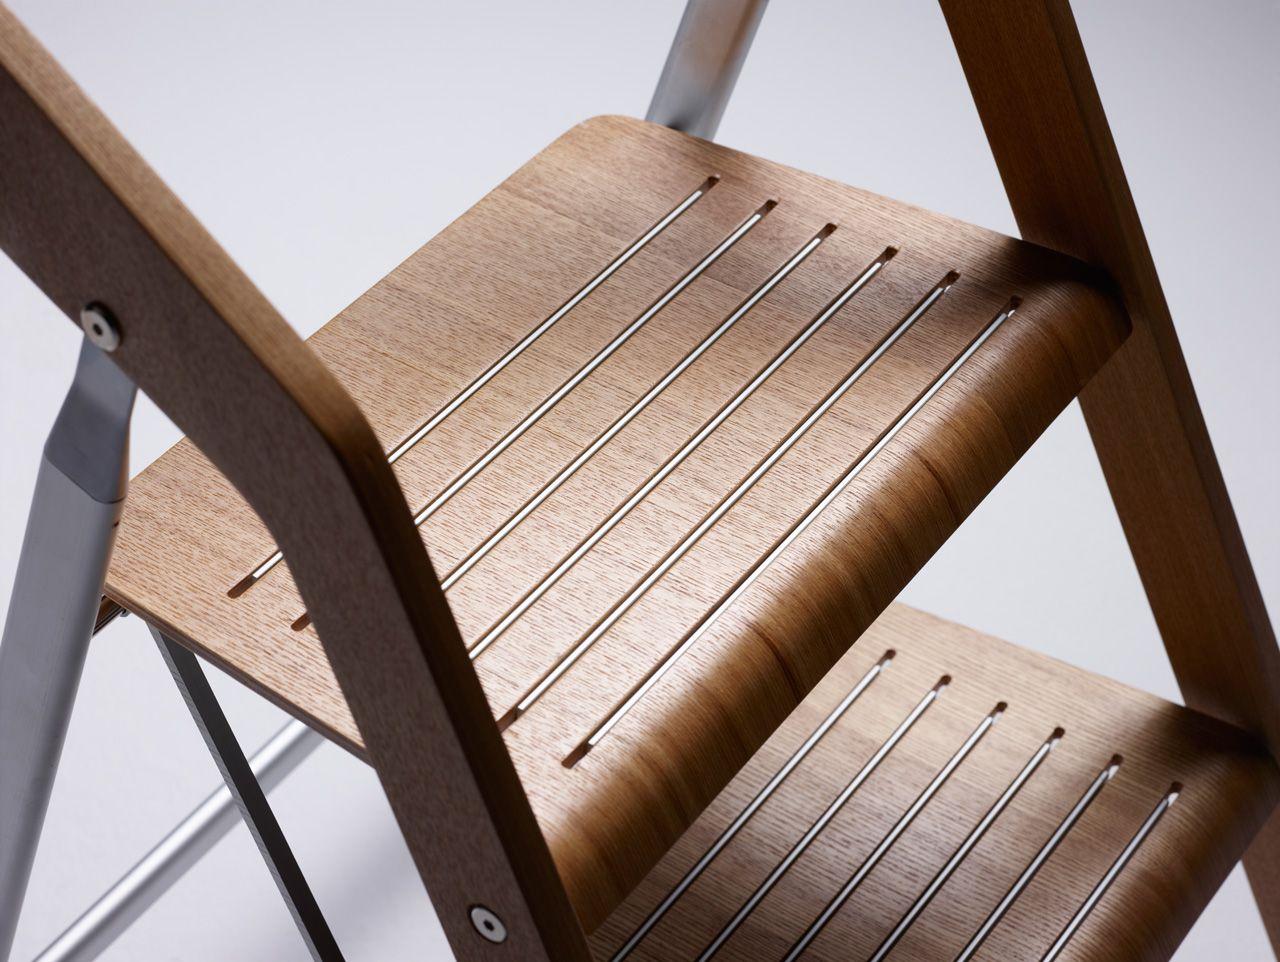 Wondrous Usit Stepladder Maarten Olden Stepstool Ladder Stool Chair Caraccident5 Cool Chair Designs And Ideas Caraccident5Info